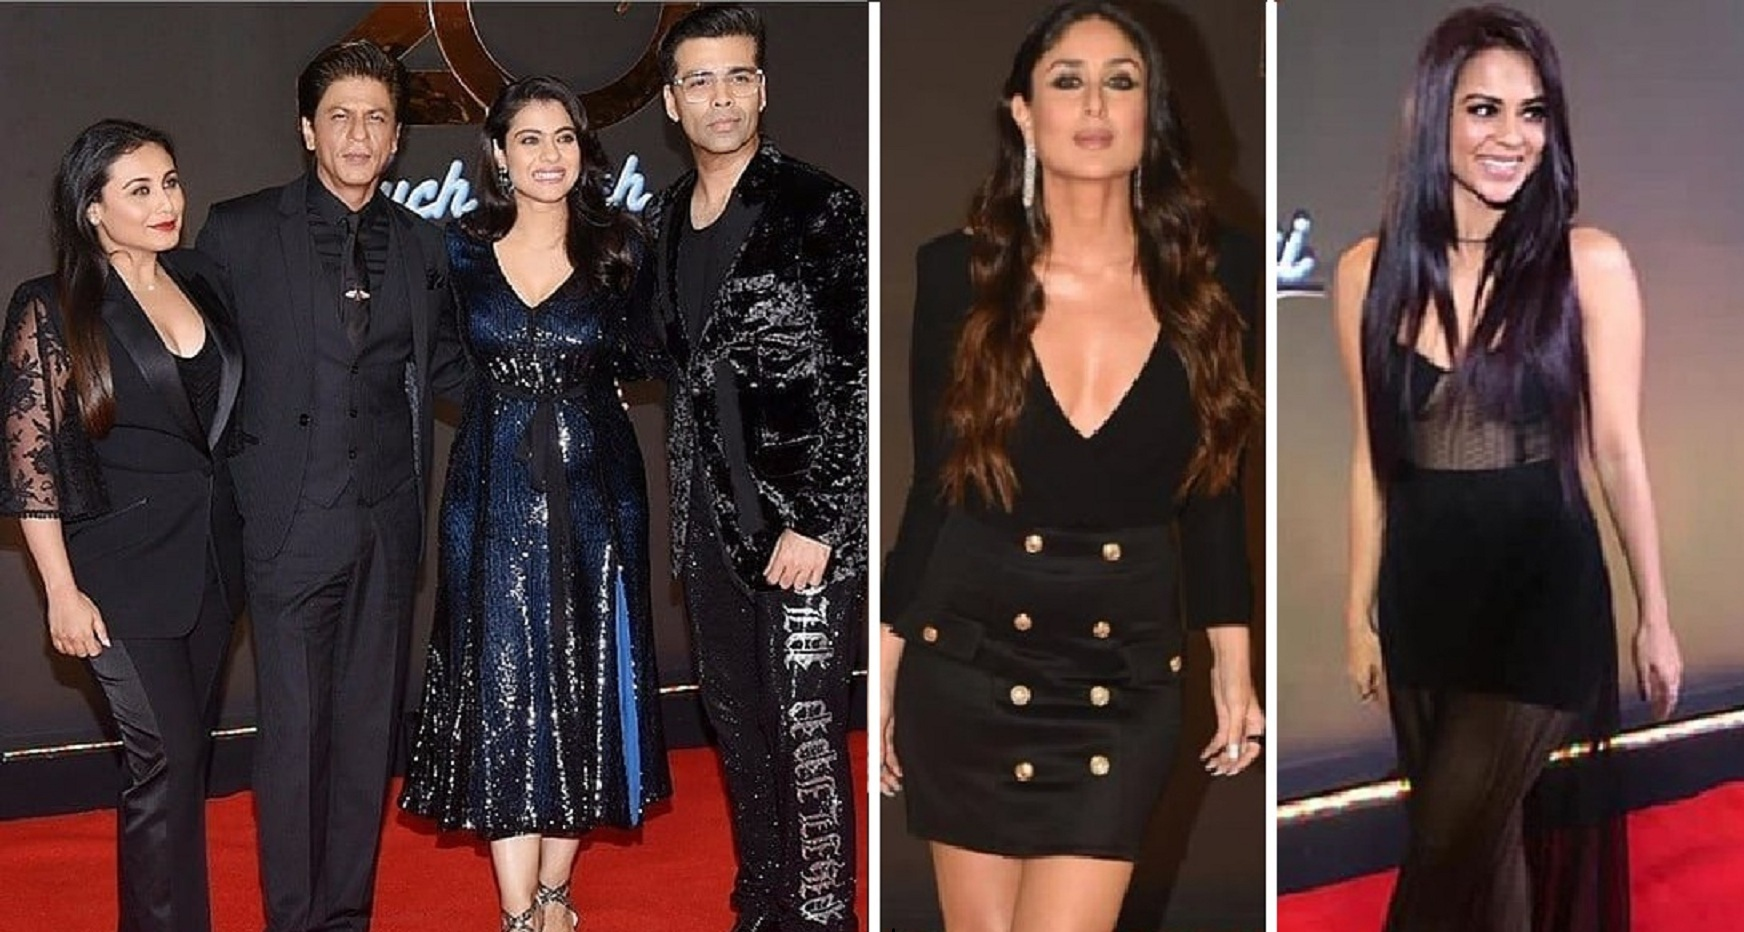 Bollywood Celebrates 20th Anniversary Of Kuch Kuch Hota Hai With A